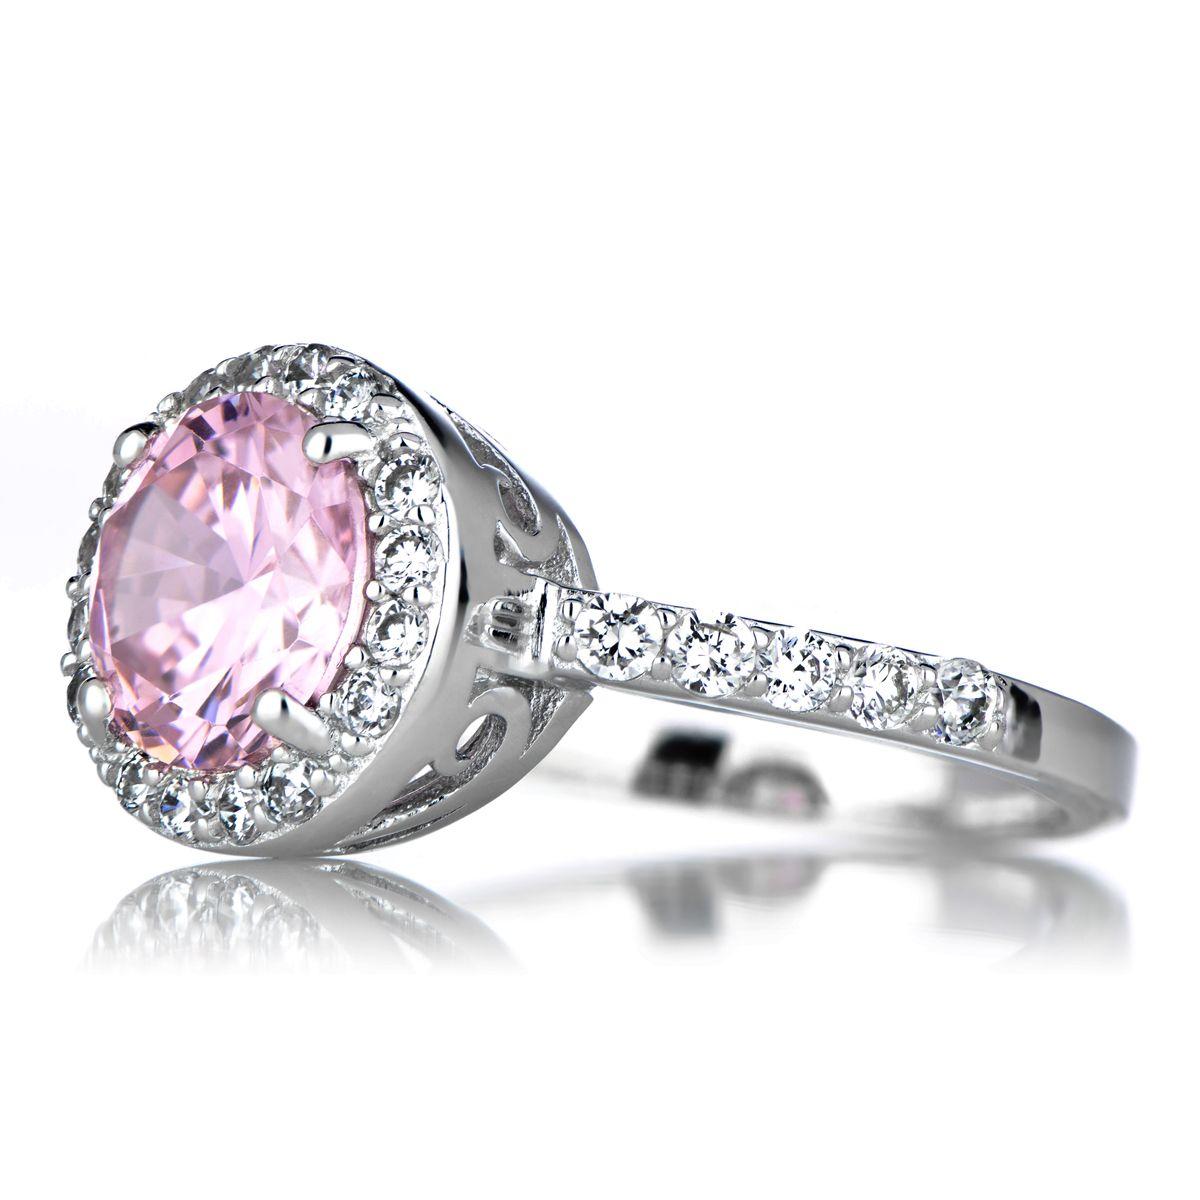 Alternate Gemstones For The Modern Engagement Ring Hammer Gem Pink Cz